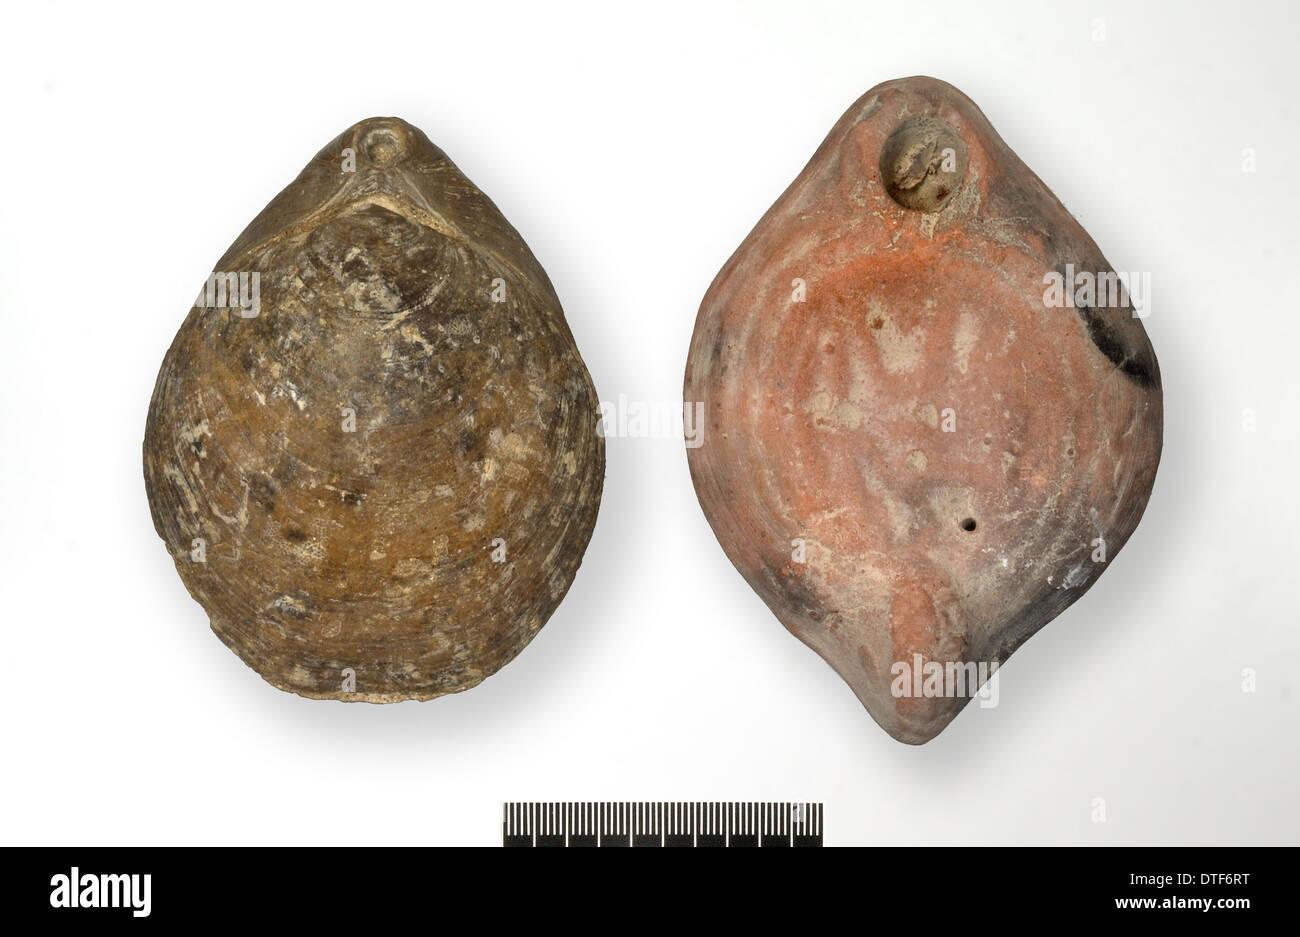 Brachiopodes fossiles et lampe romaine Photo Stock